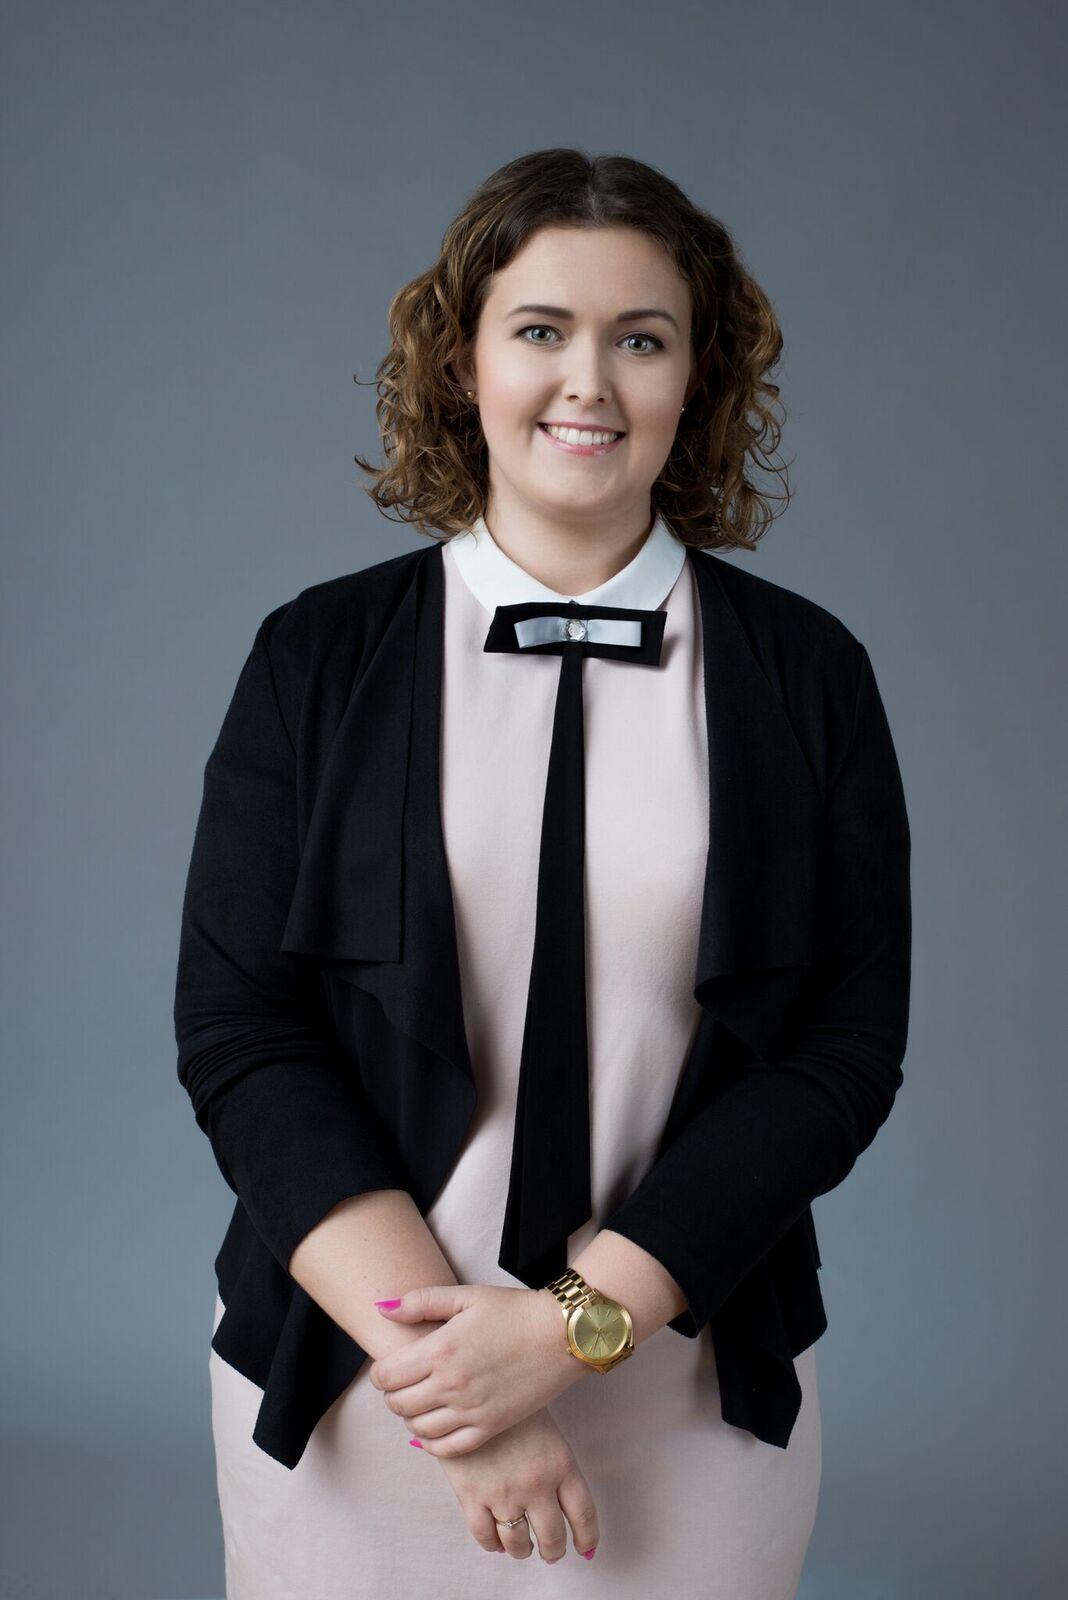 Marta Pniewska-Kaczmarek